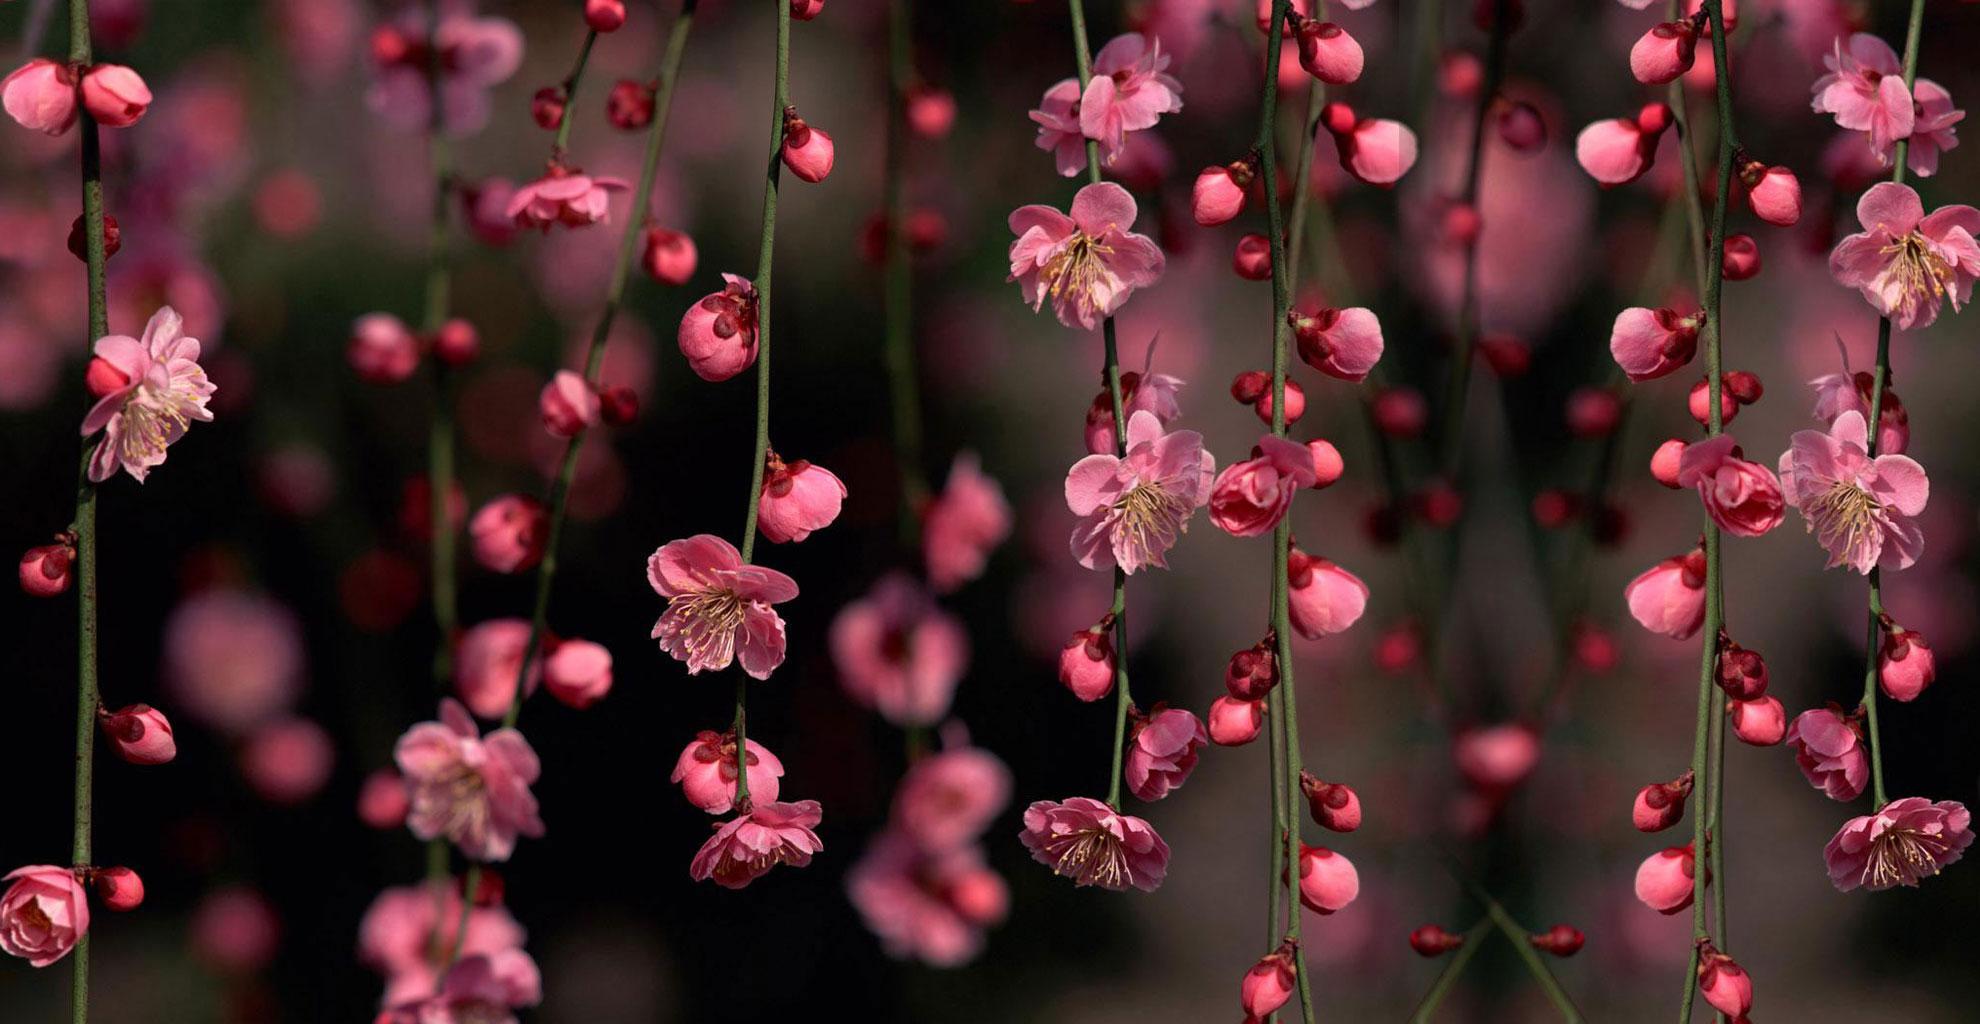 Best 44 Twitter Backgrounds Flowers on HipWallpaper Twitter 1980x1024